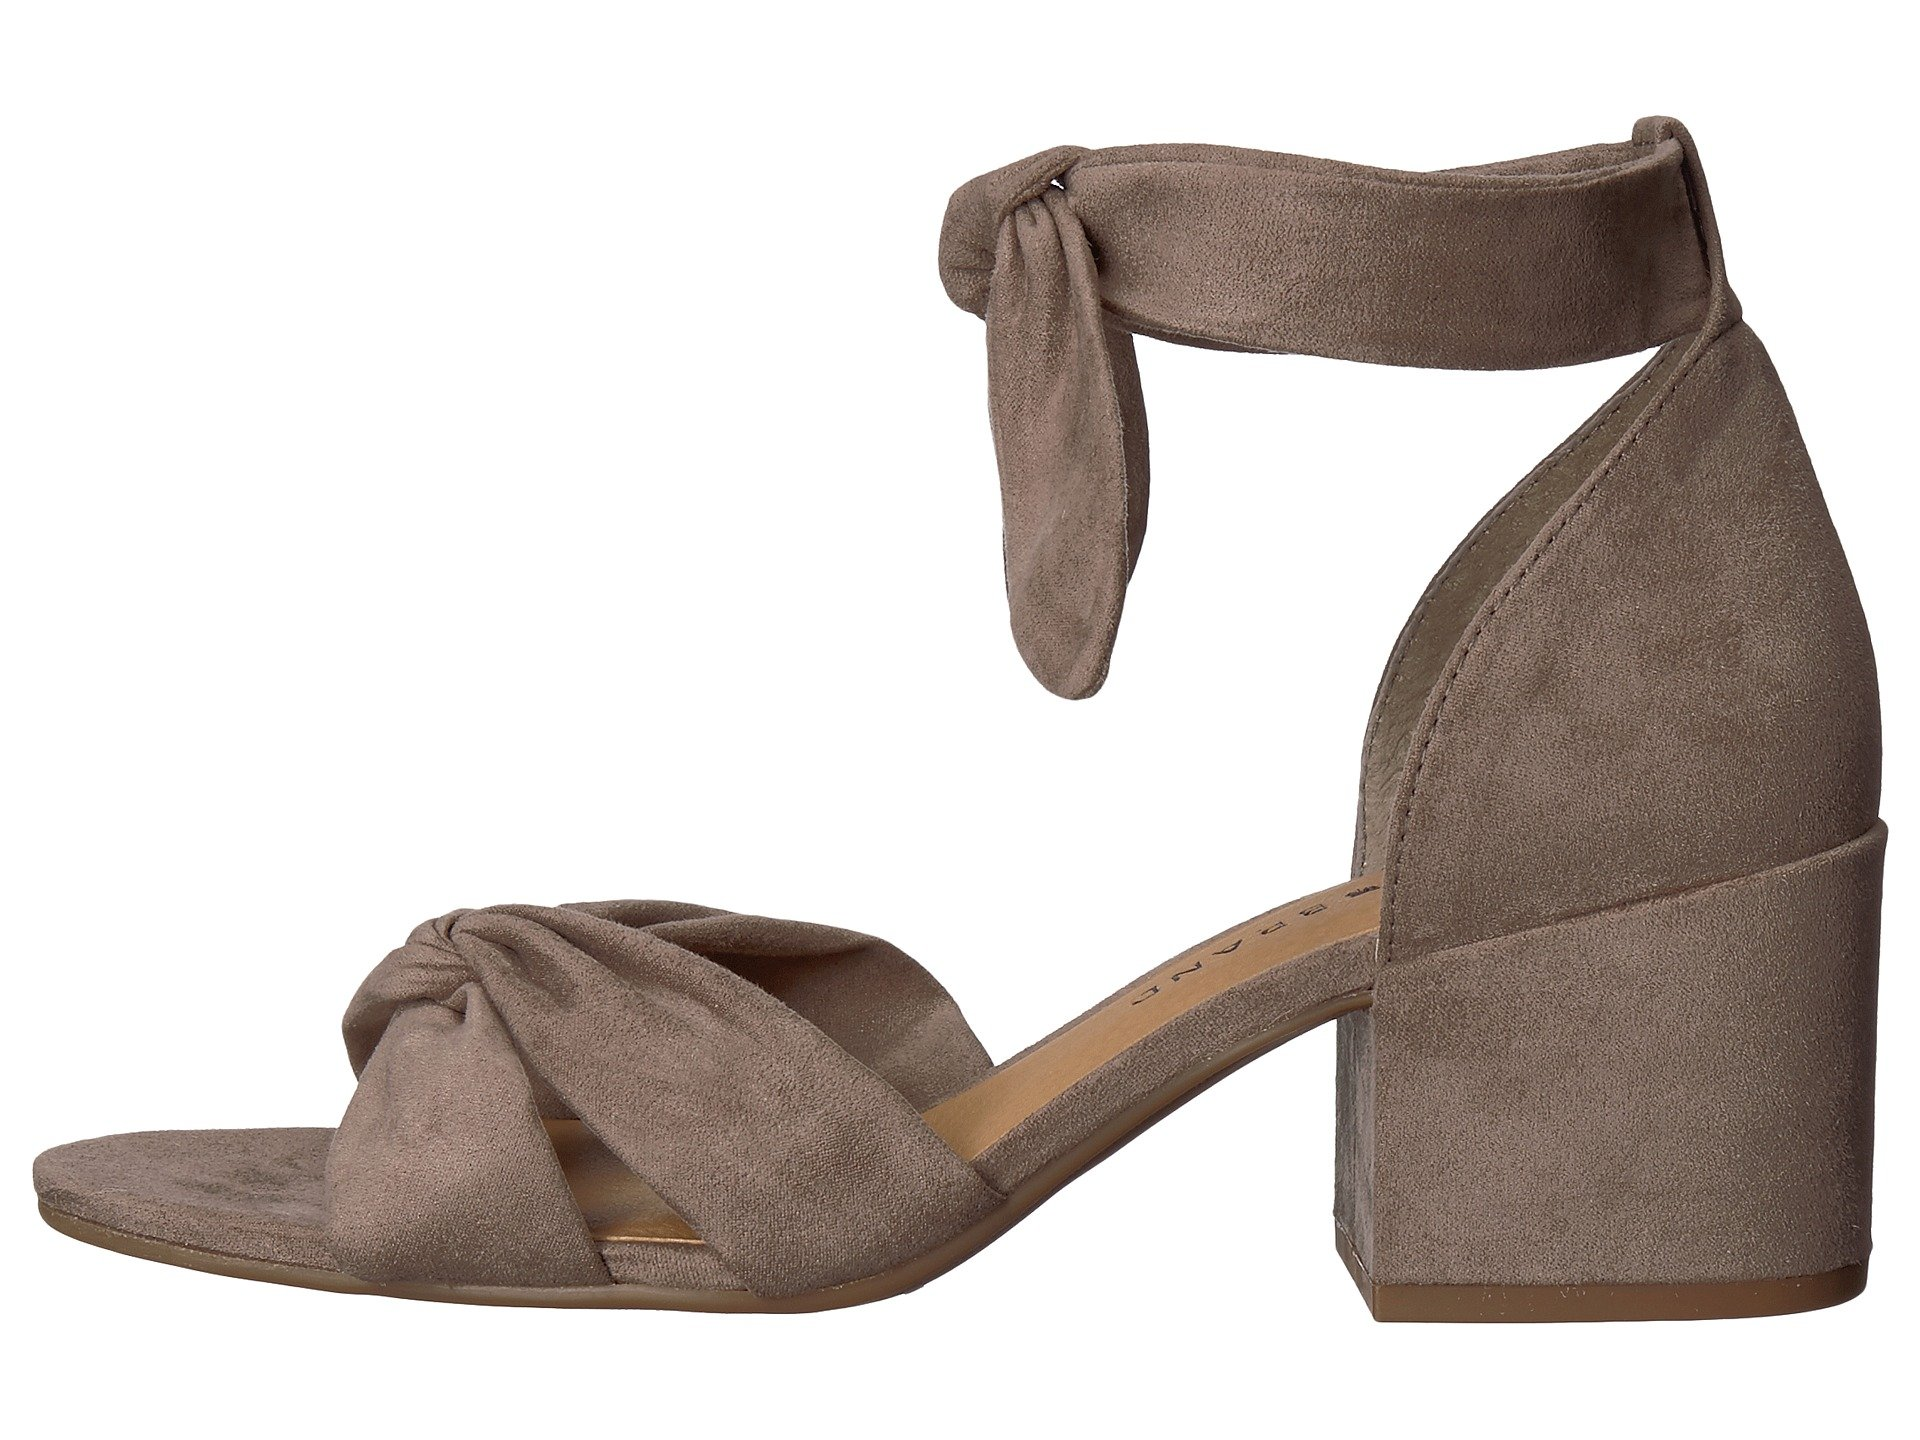 965d3952bc0 Lucky Brand Women s XAYLAH Heeled Sandal